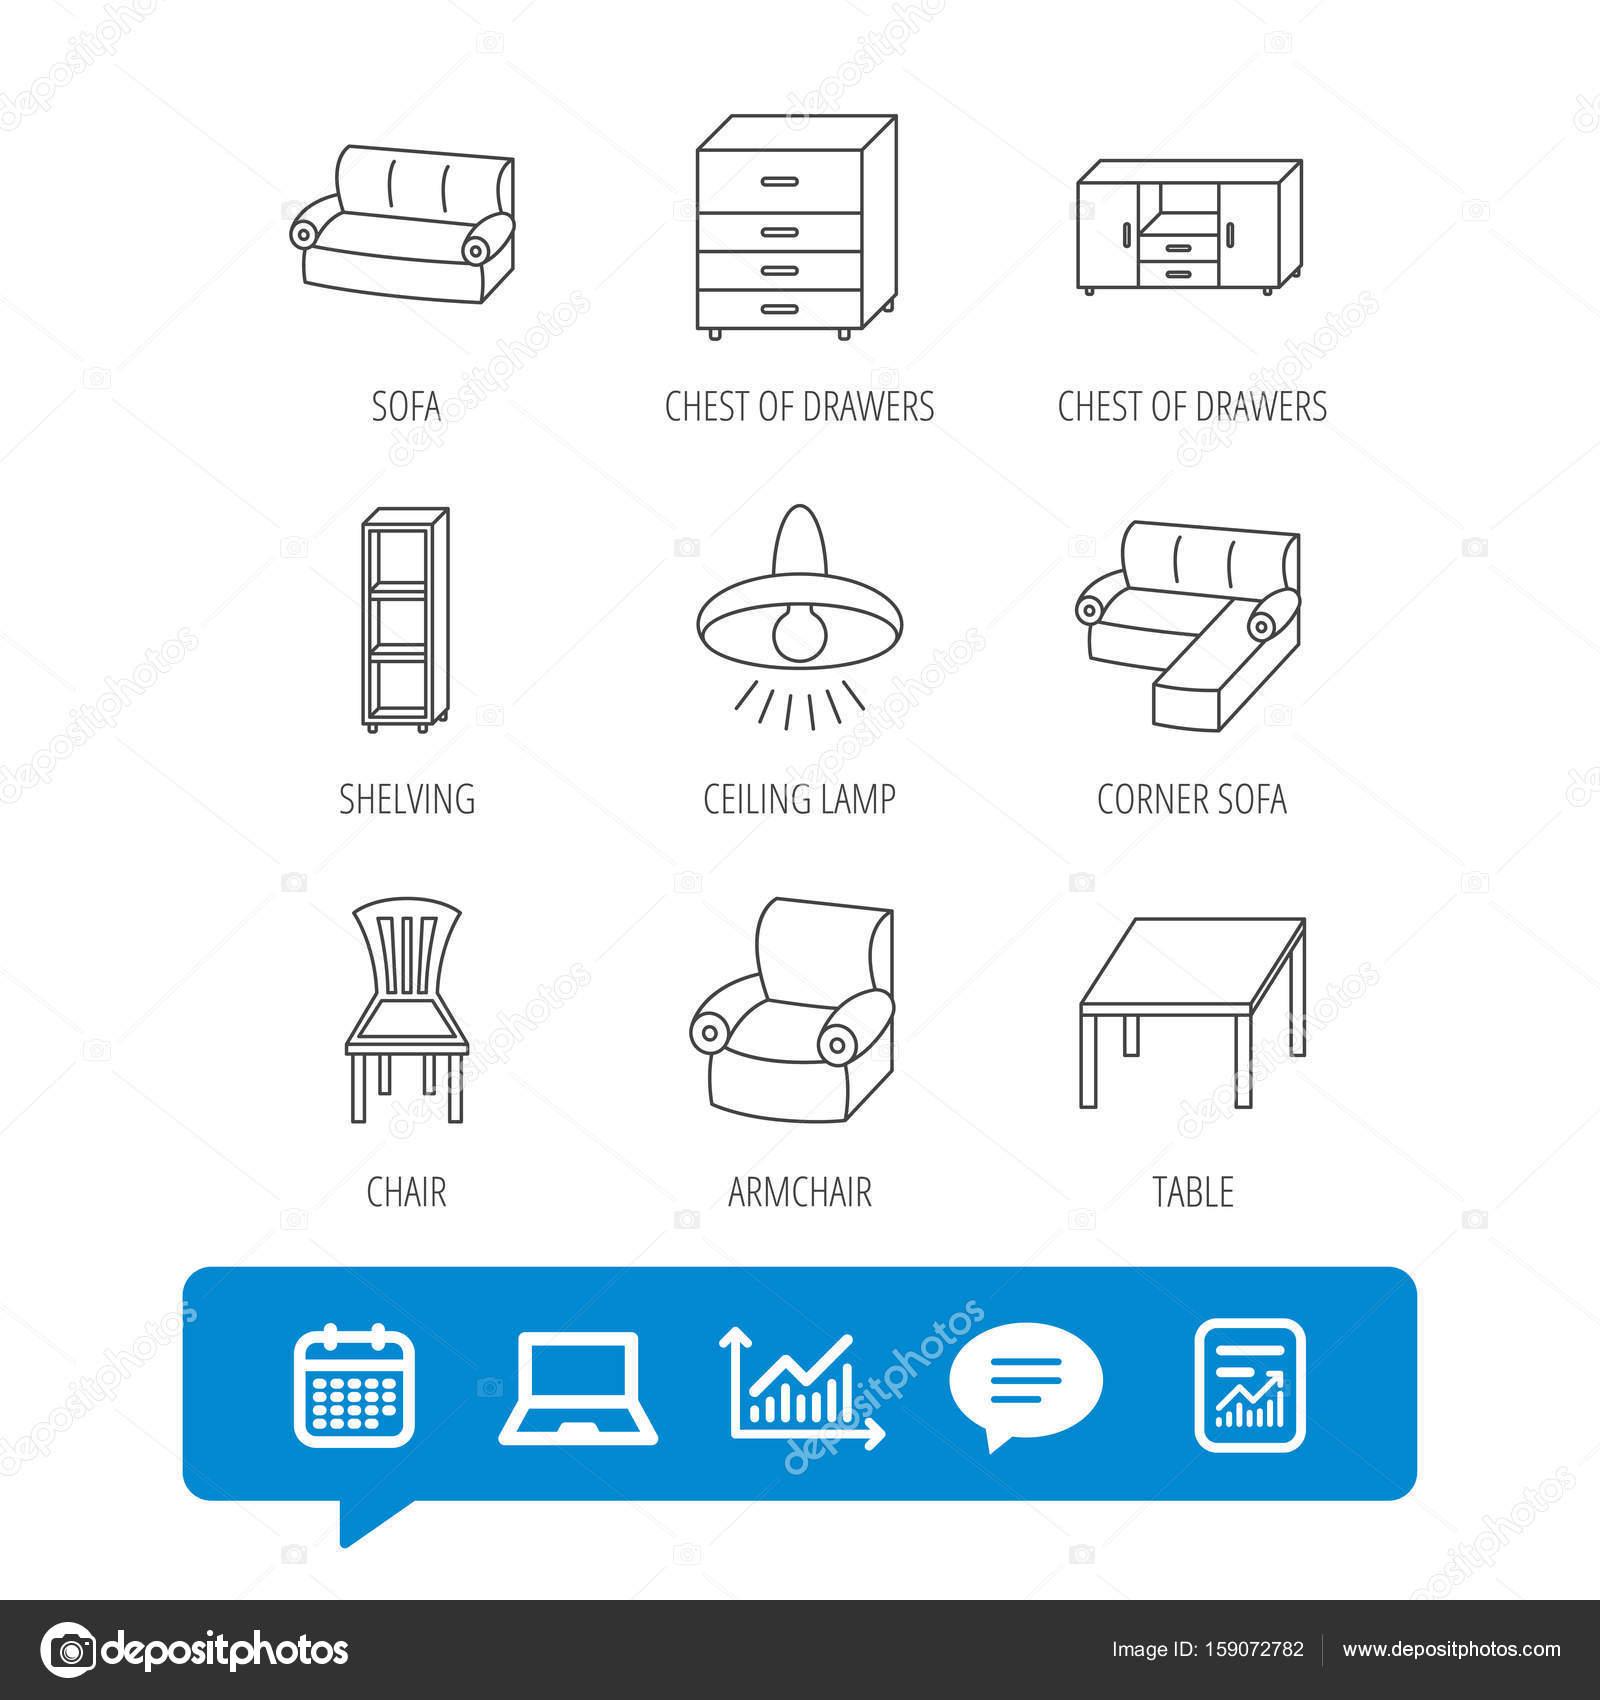 Corner Sofa Table And Armchair Icons Stock Vector C Tanyastock